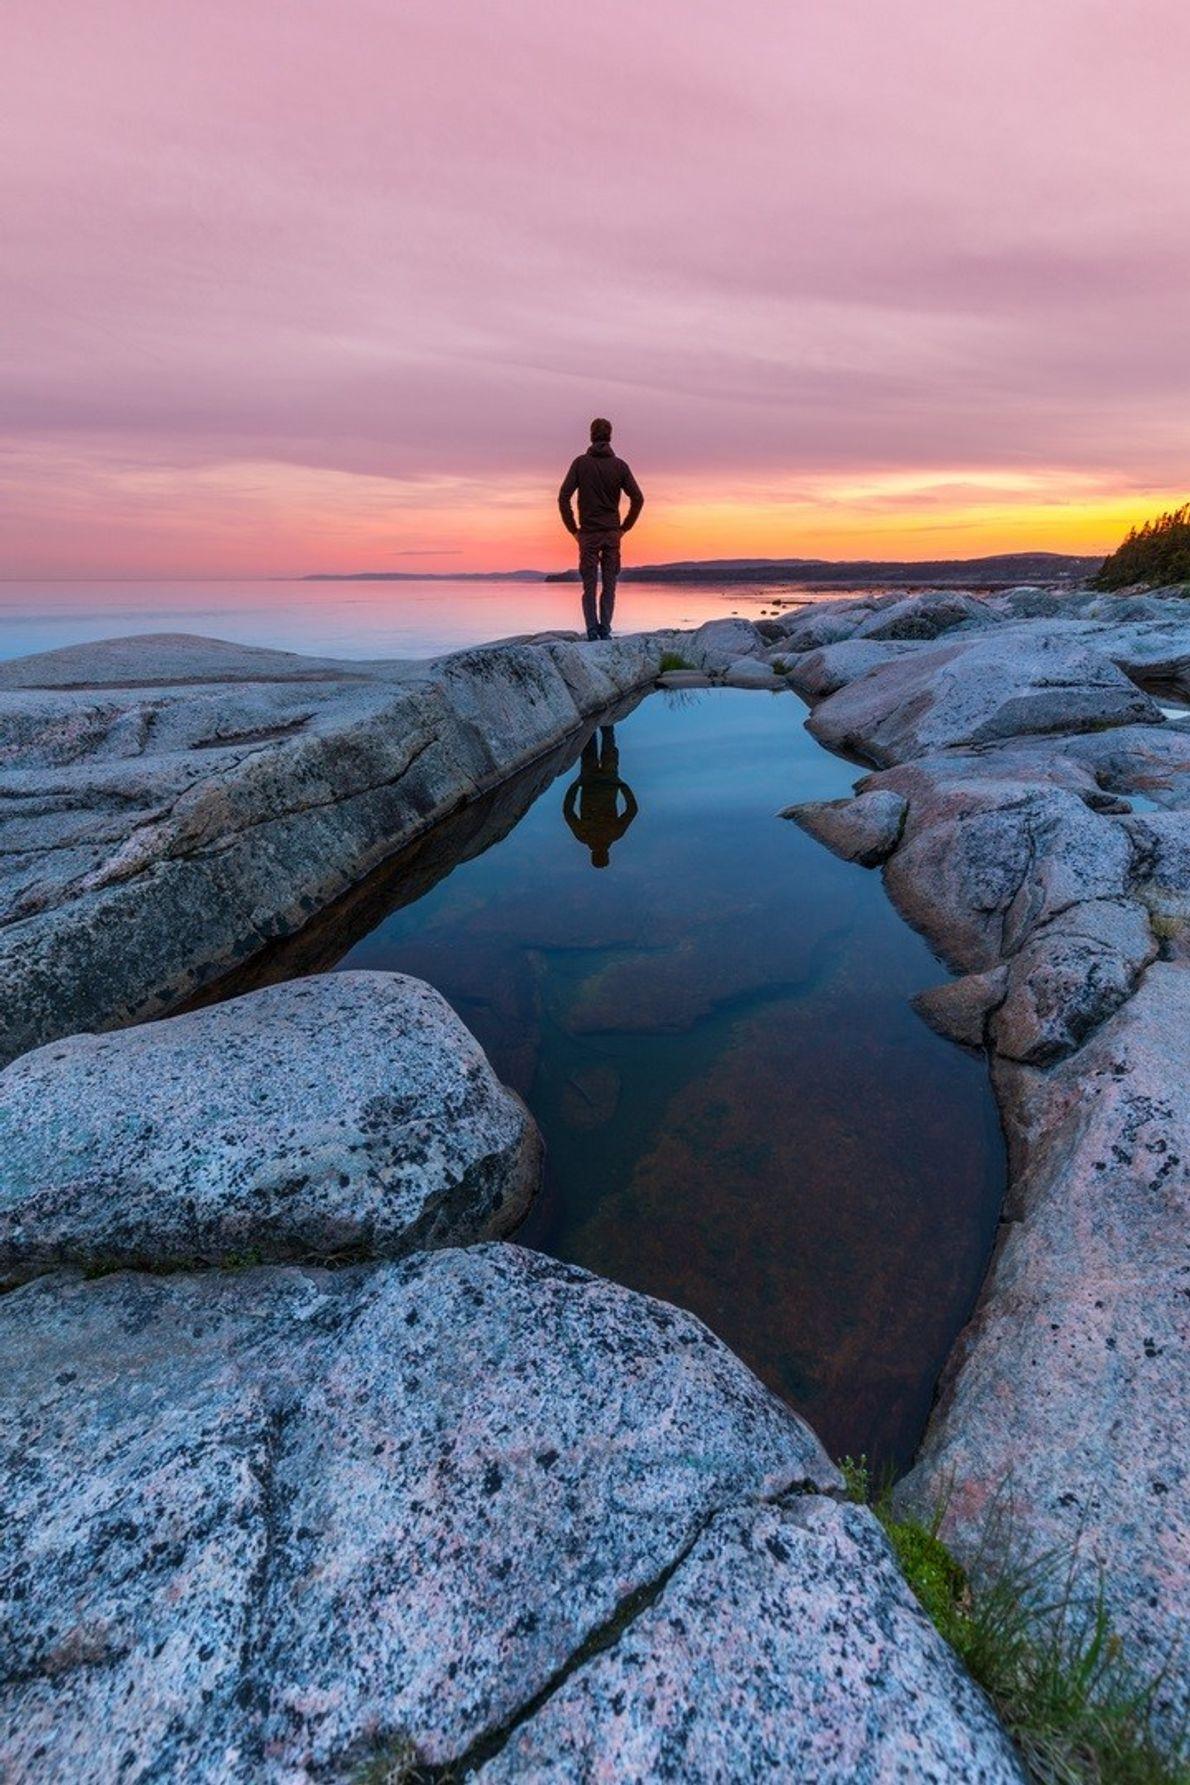 A sunrise or sunset visit to the Cap de Bon-Désir Interpretation and Observation Centre offers the ...